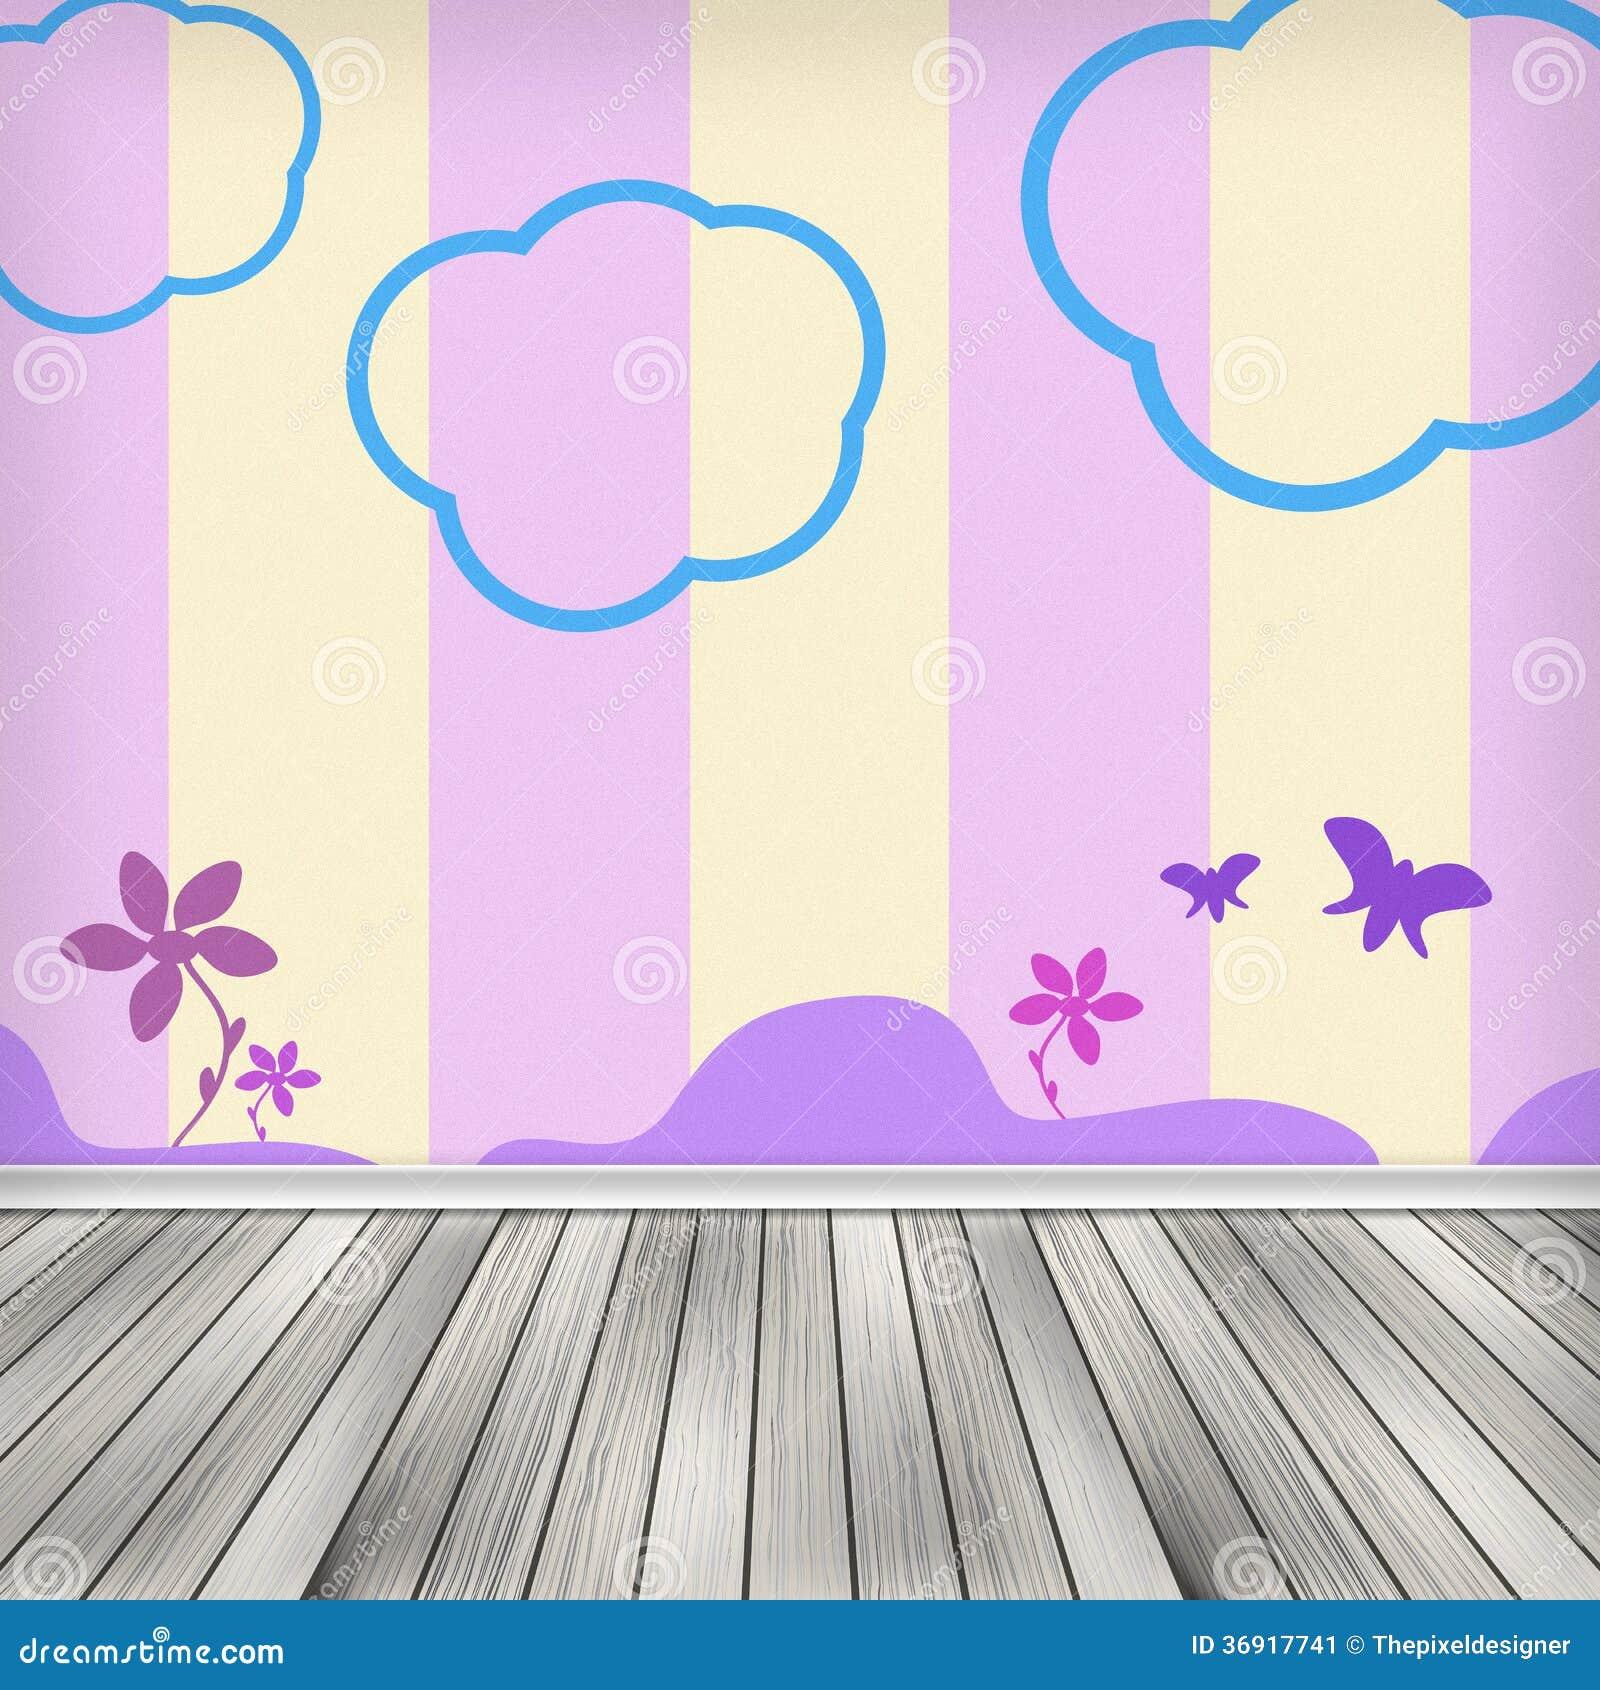 Kids Room Interior Stock Image Image 36917741